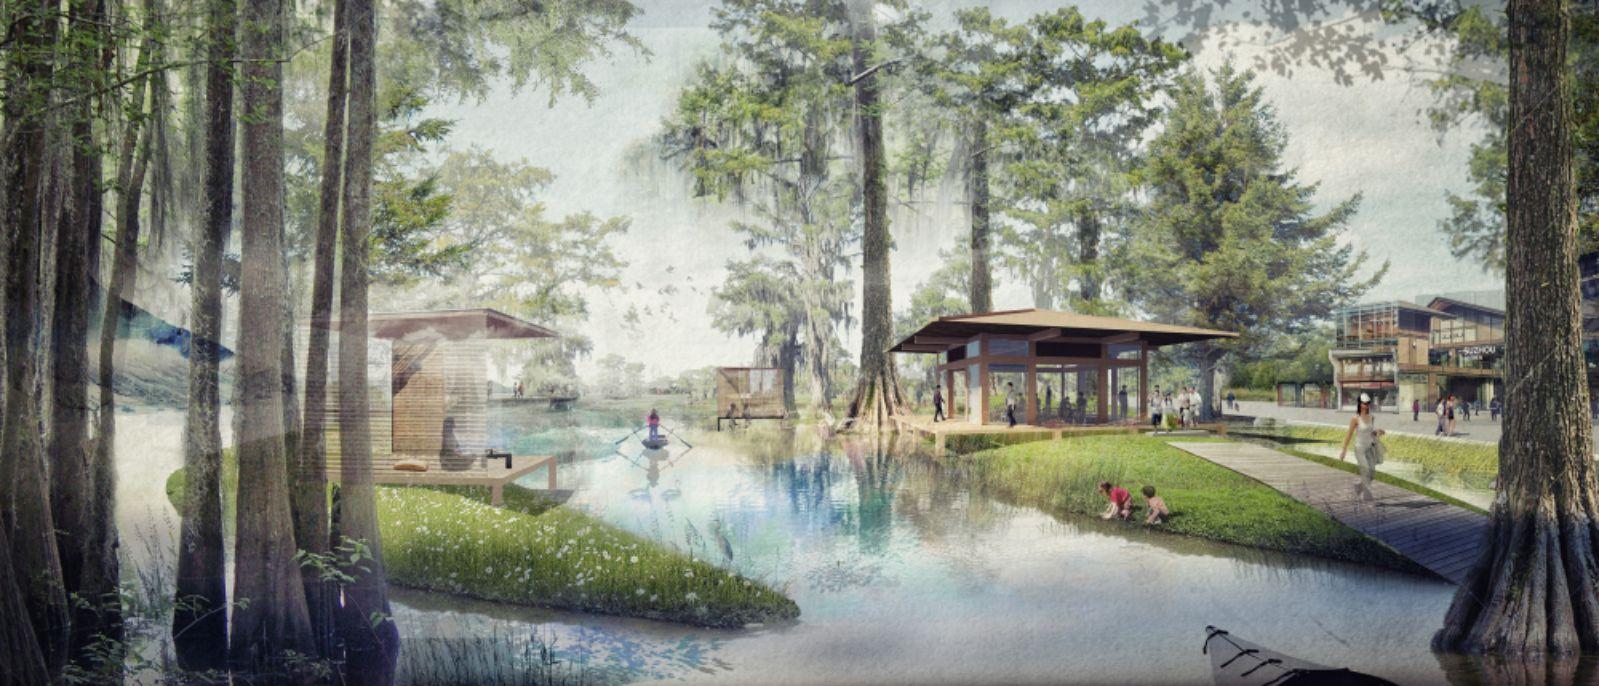 Cypress Islands and tea house